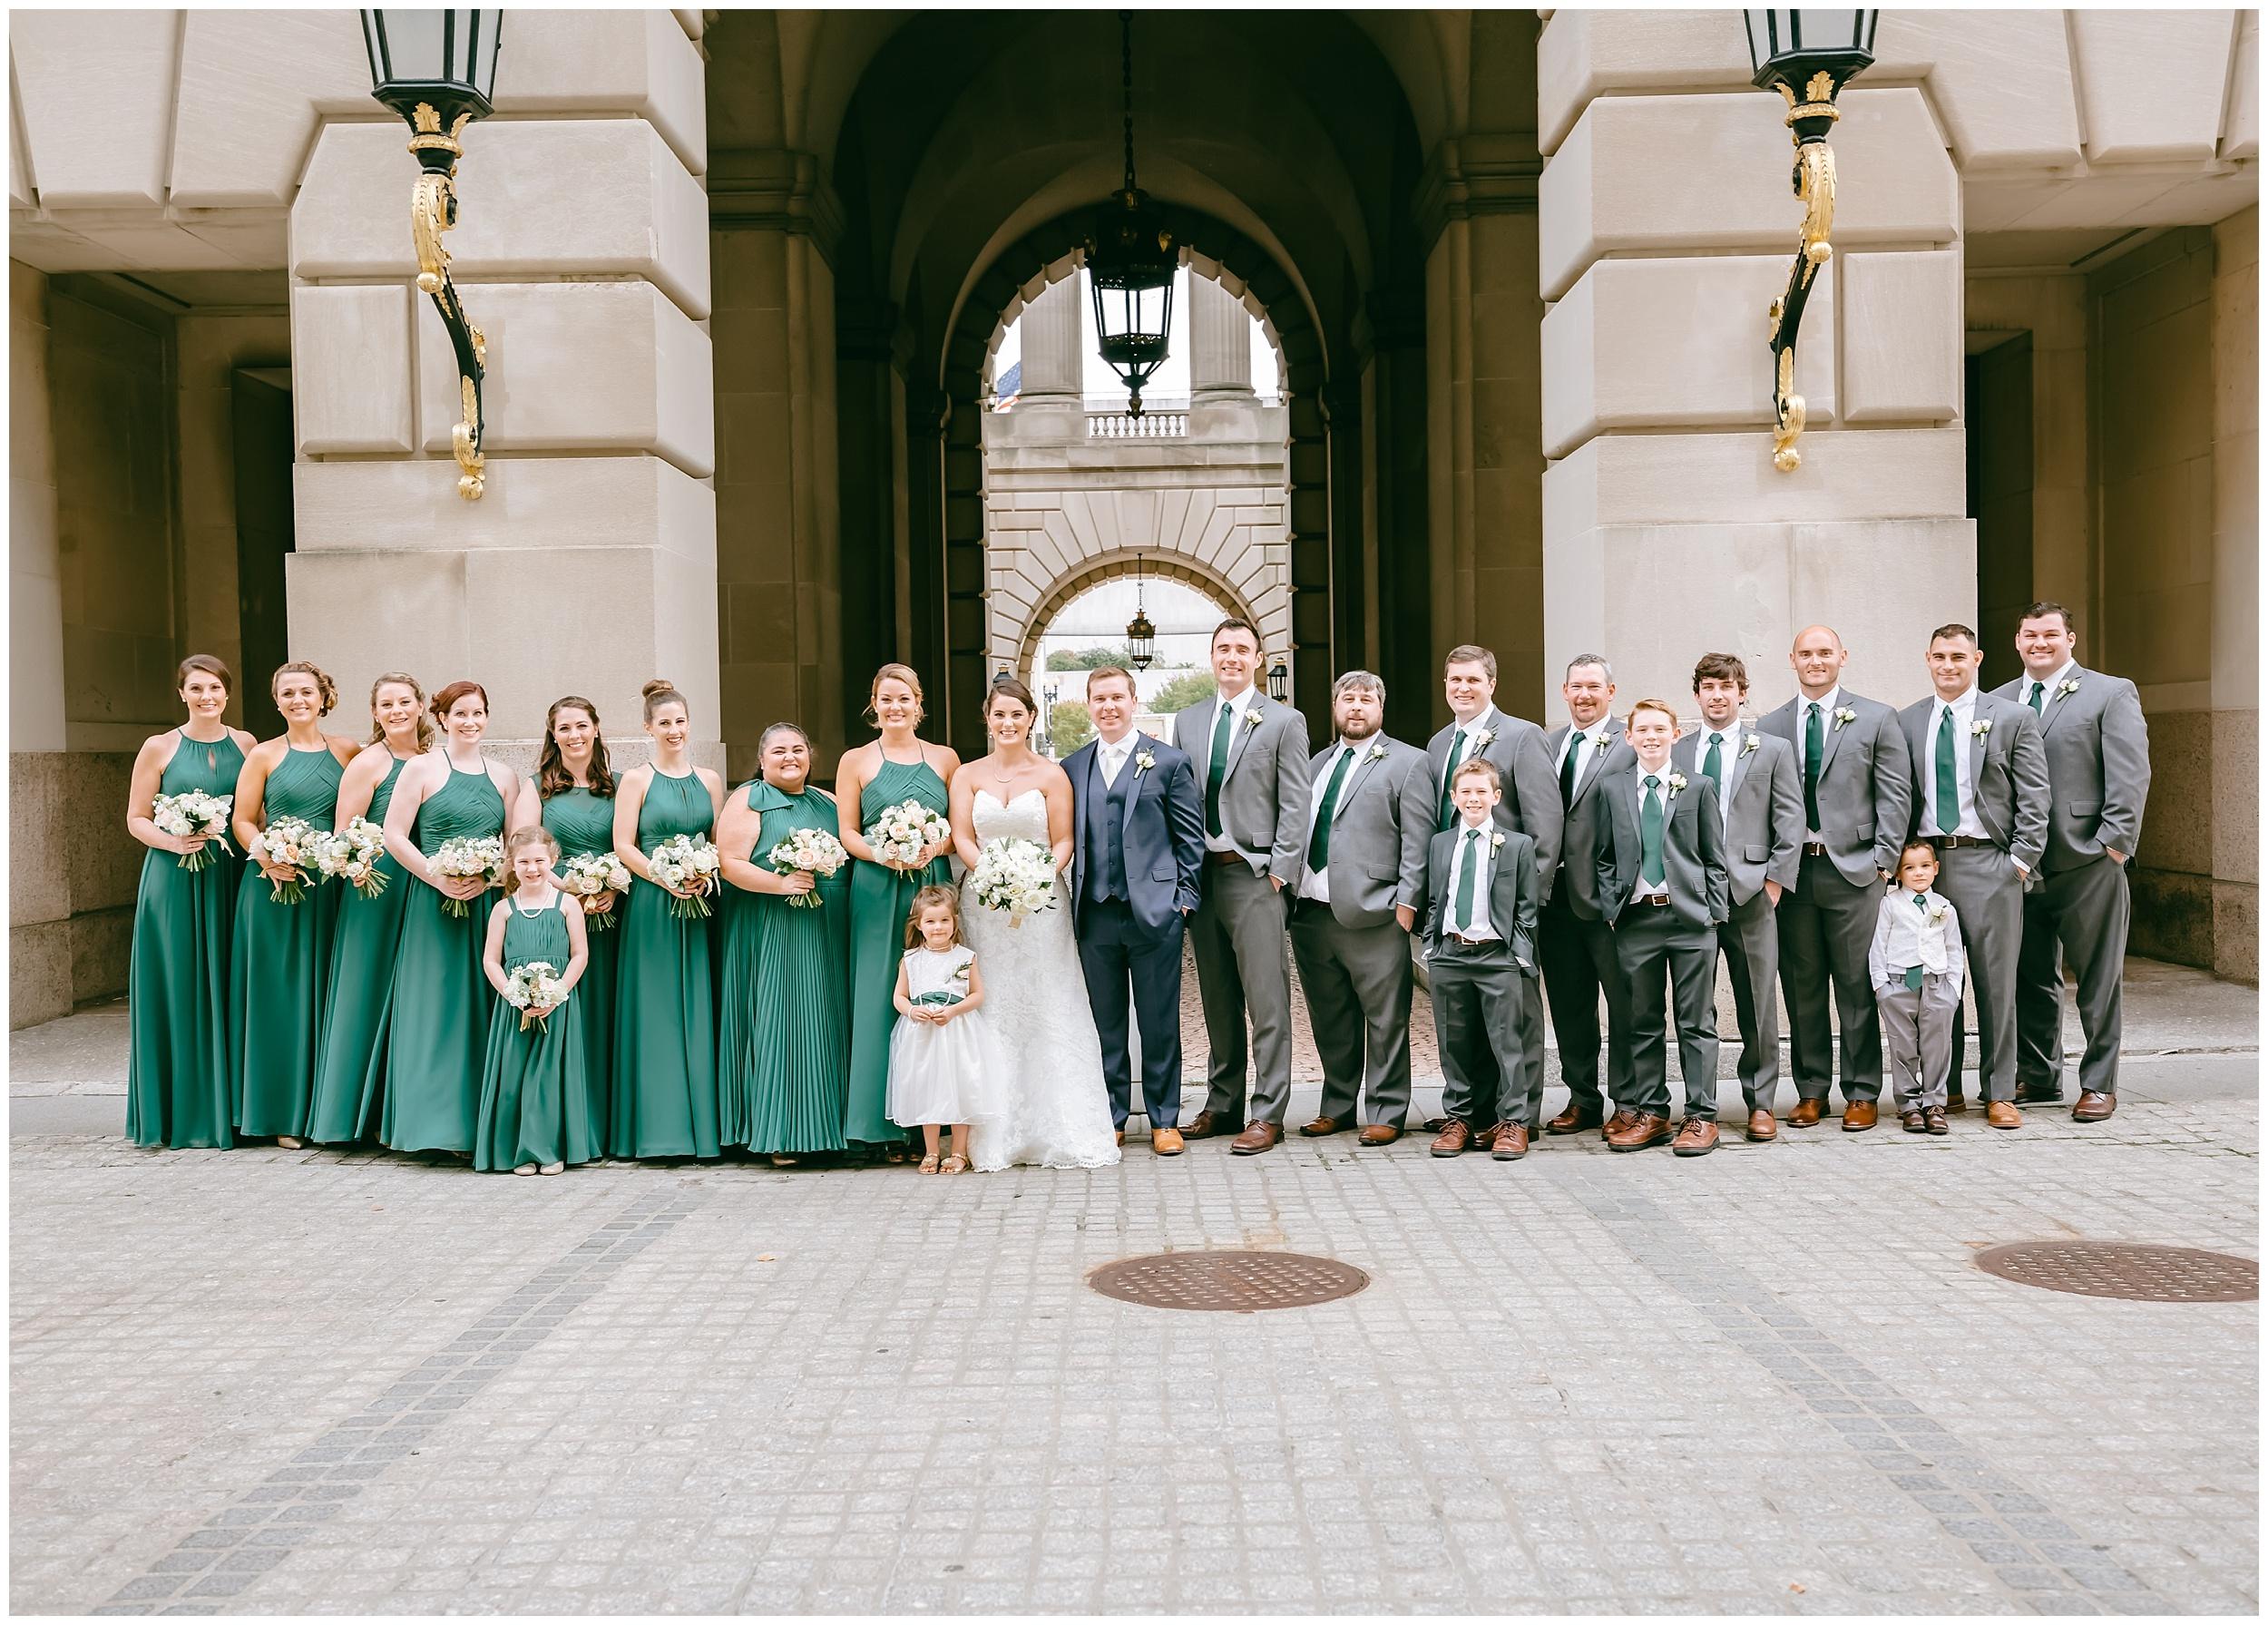 wedding-party-bridal-formal-portraits-washington-dc-photographer